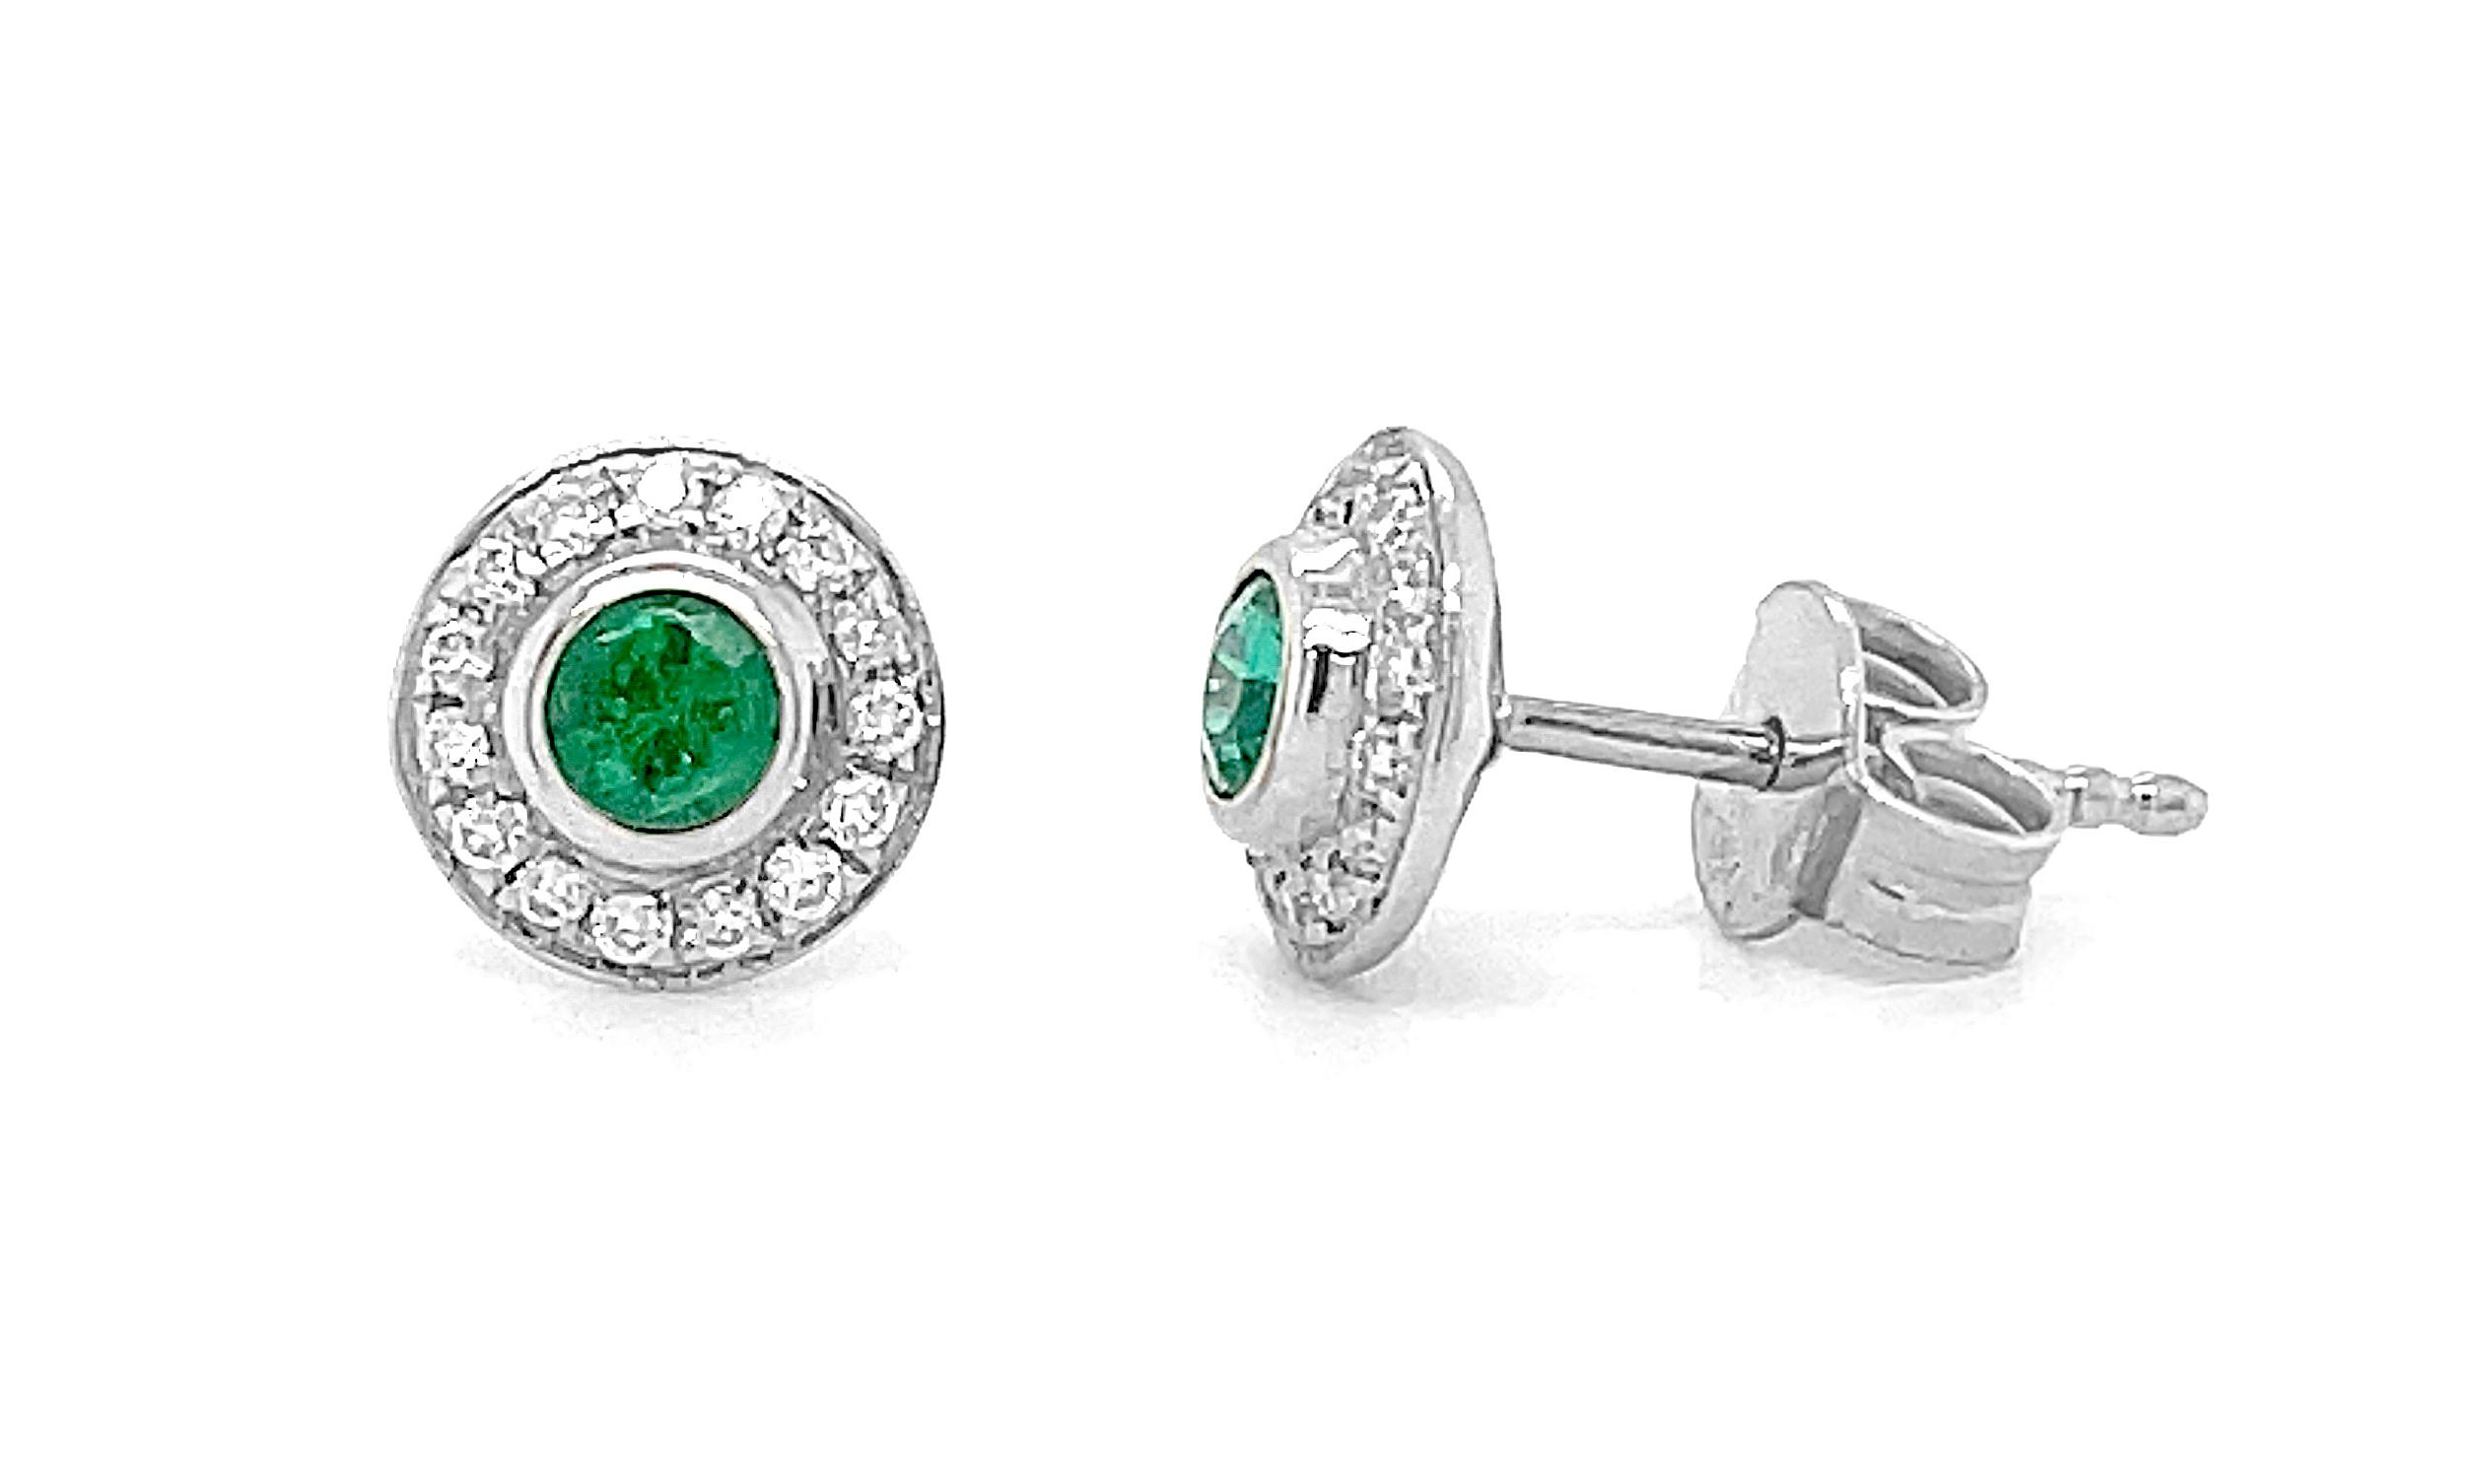 Round Emerald & Diamond Cluster Stud Earrings